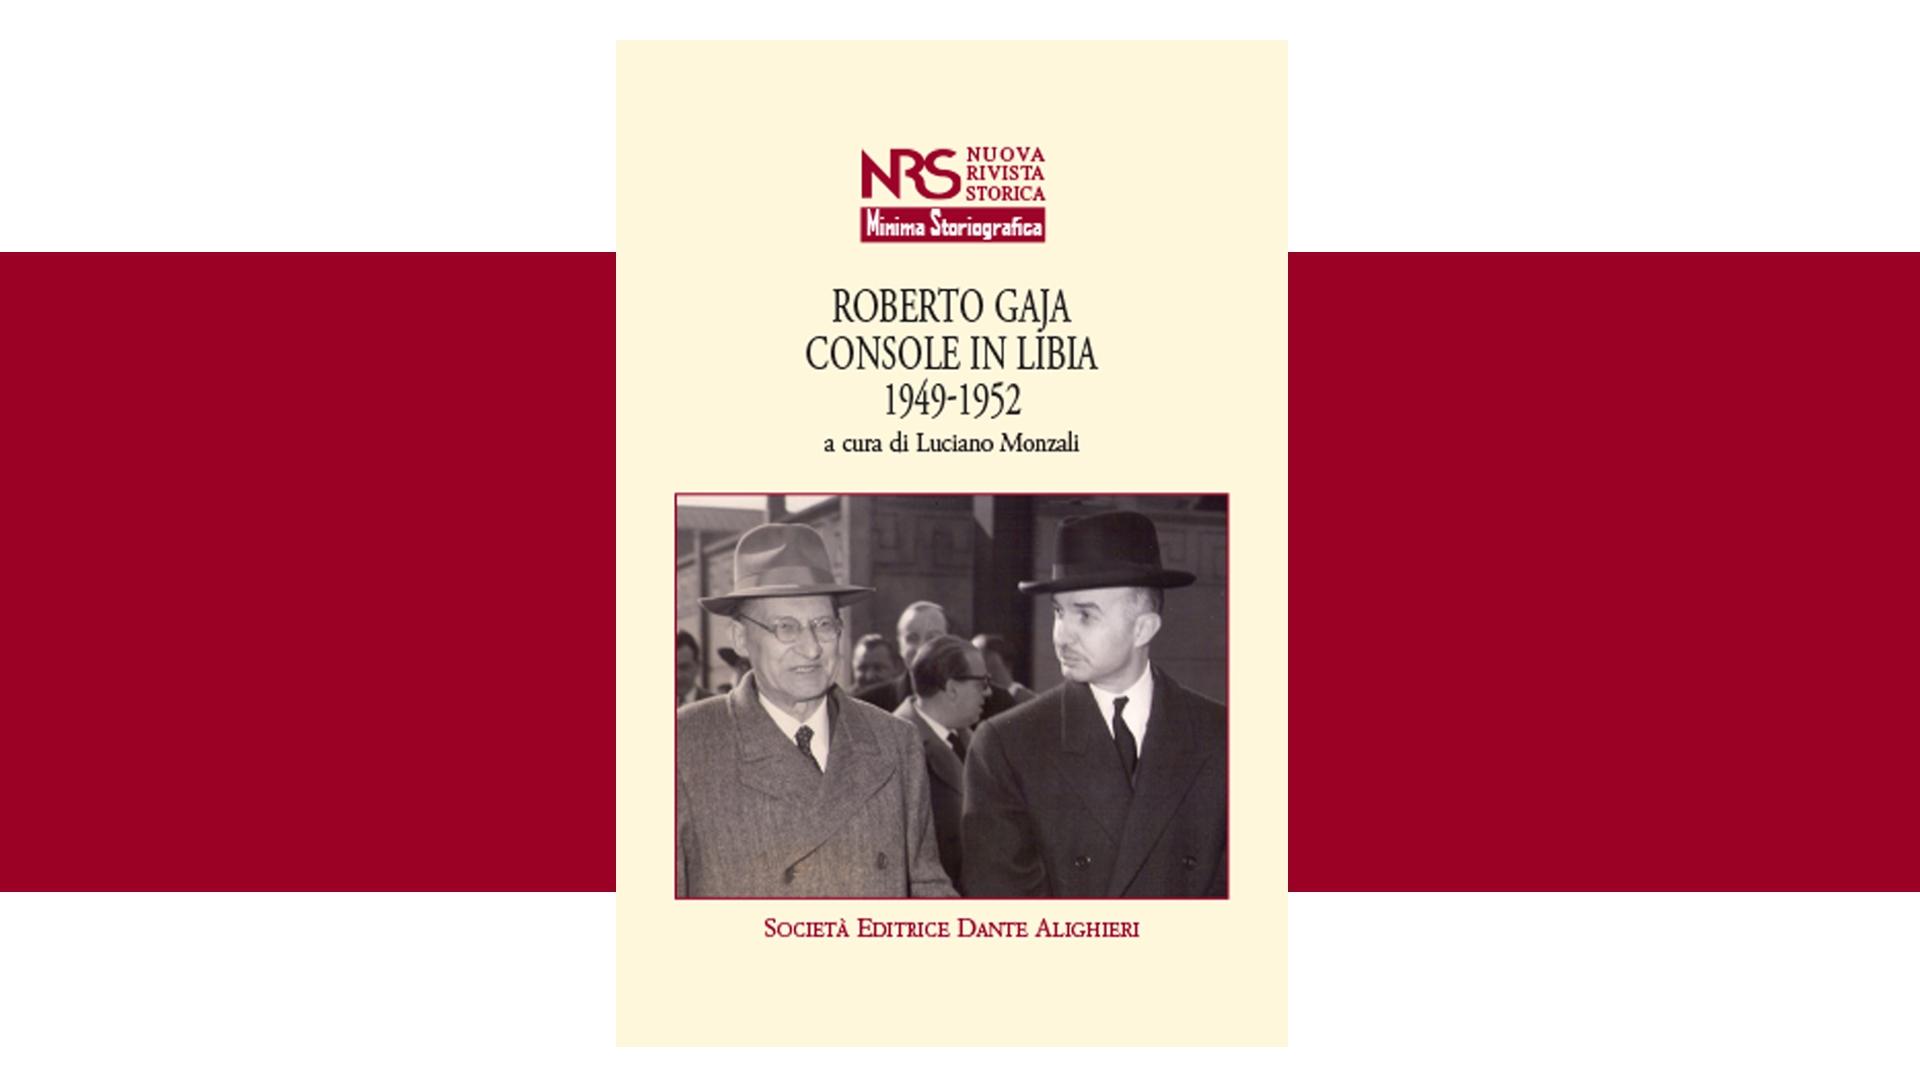 Roberto Gaja Console in Libia 1949-1952